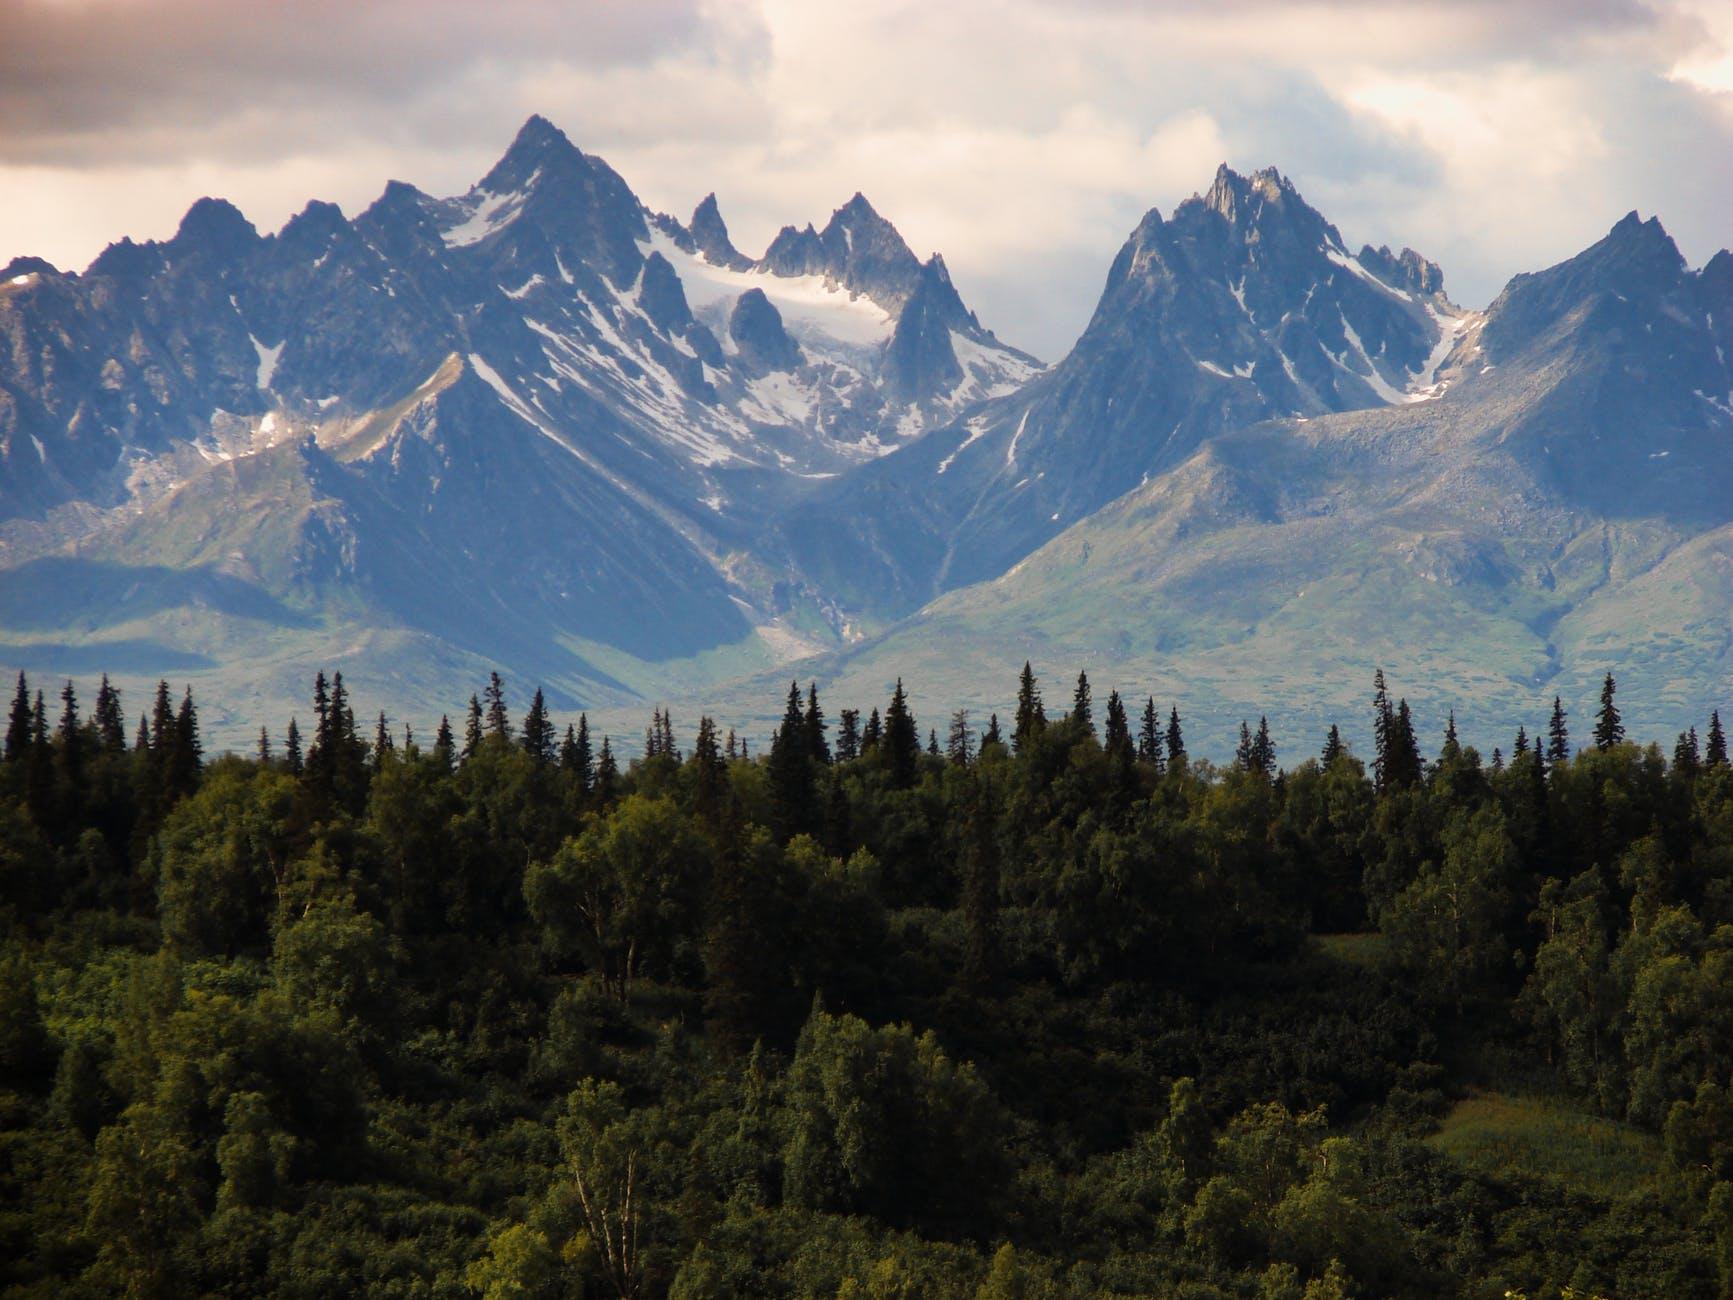 wood landscape mountains nature